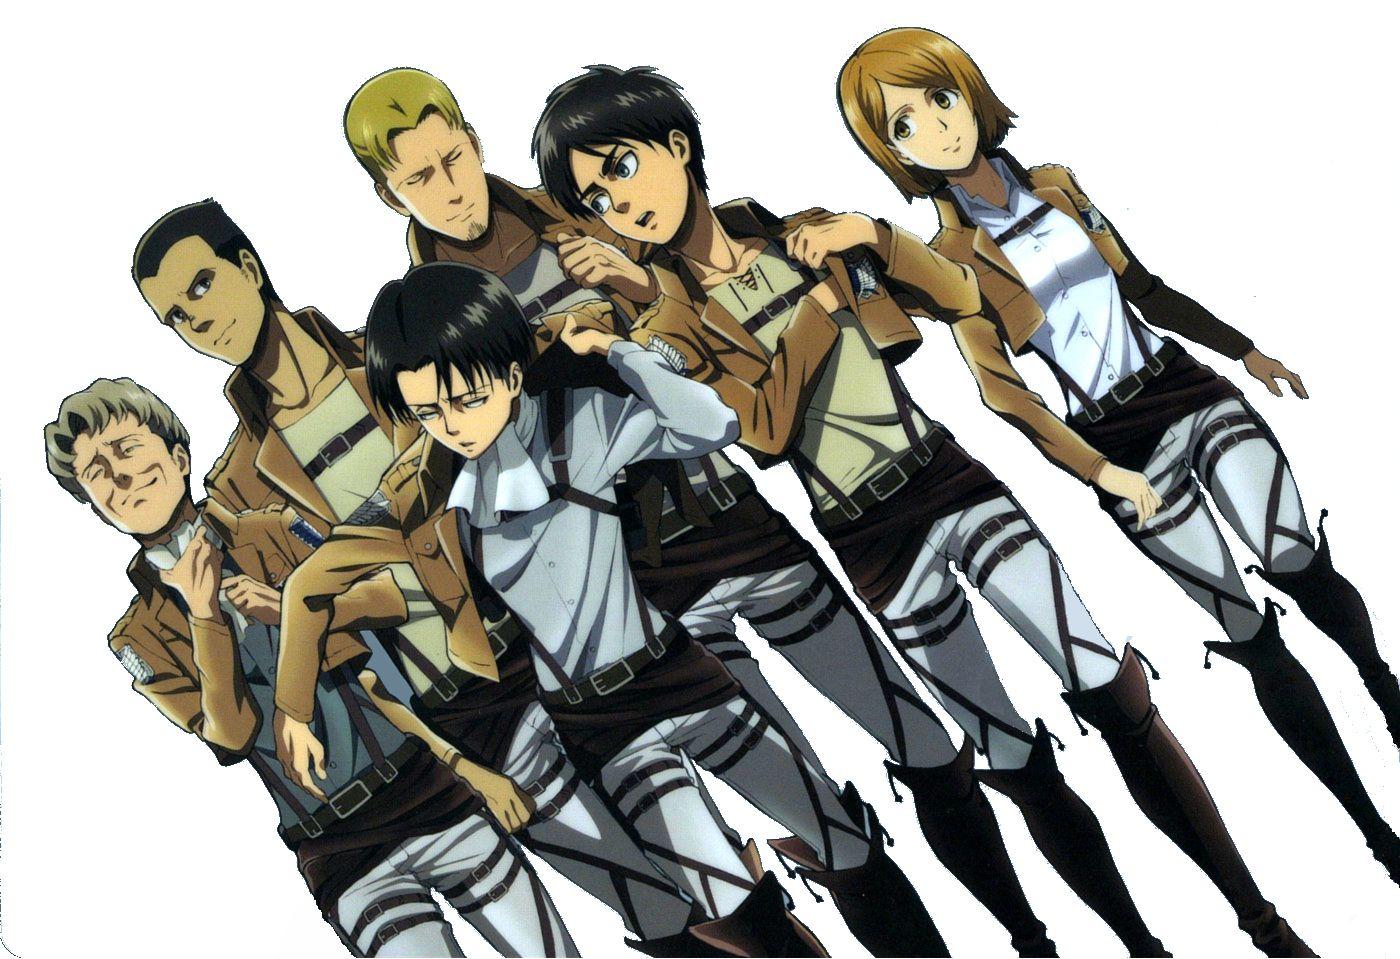 Anime Attack On Titan Wallpaper Attack On Titan Levi Attack On Titan Anime Attack On Titan